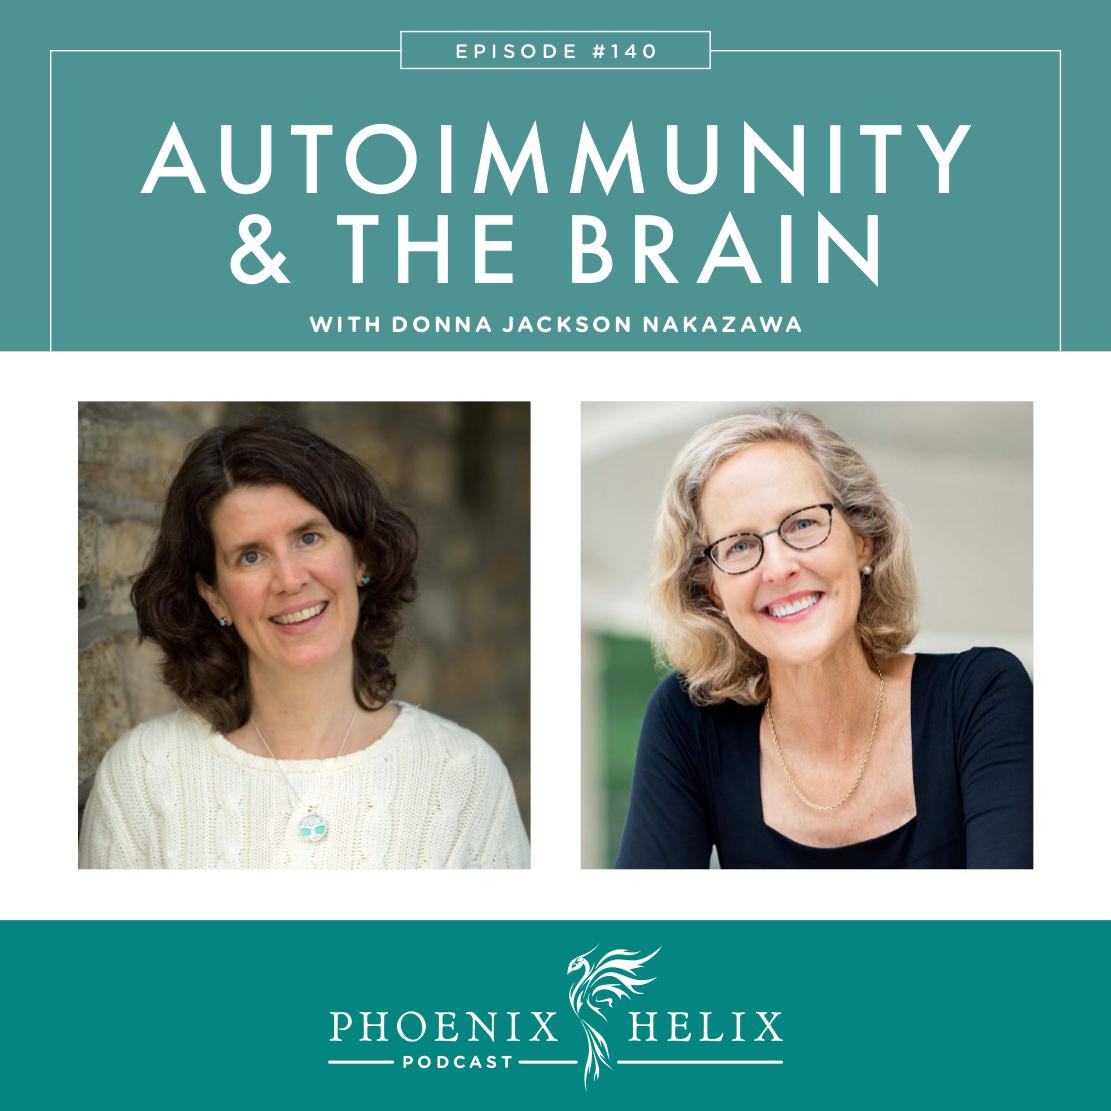 Autoimmunity & the Brain with Donna Jackson Nakazawa | Phoenix Helix Podcast